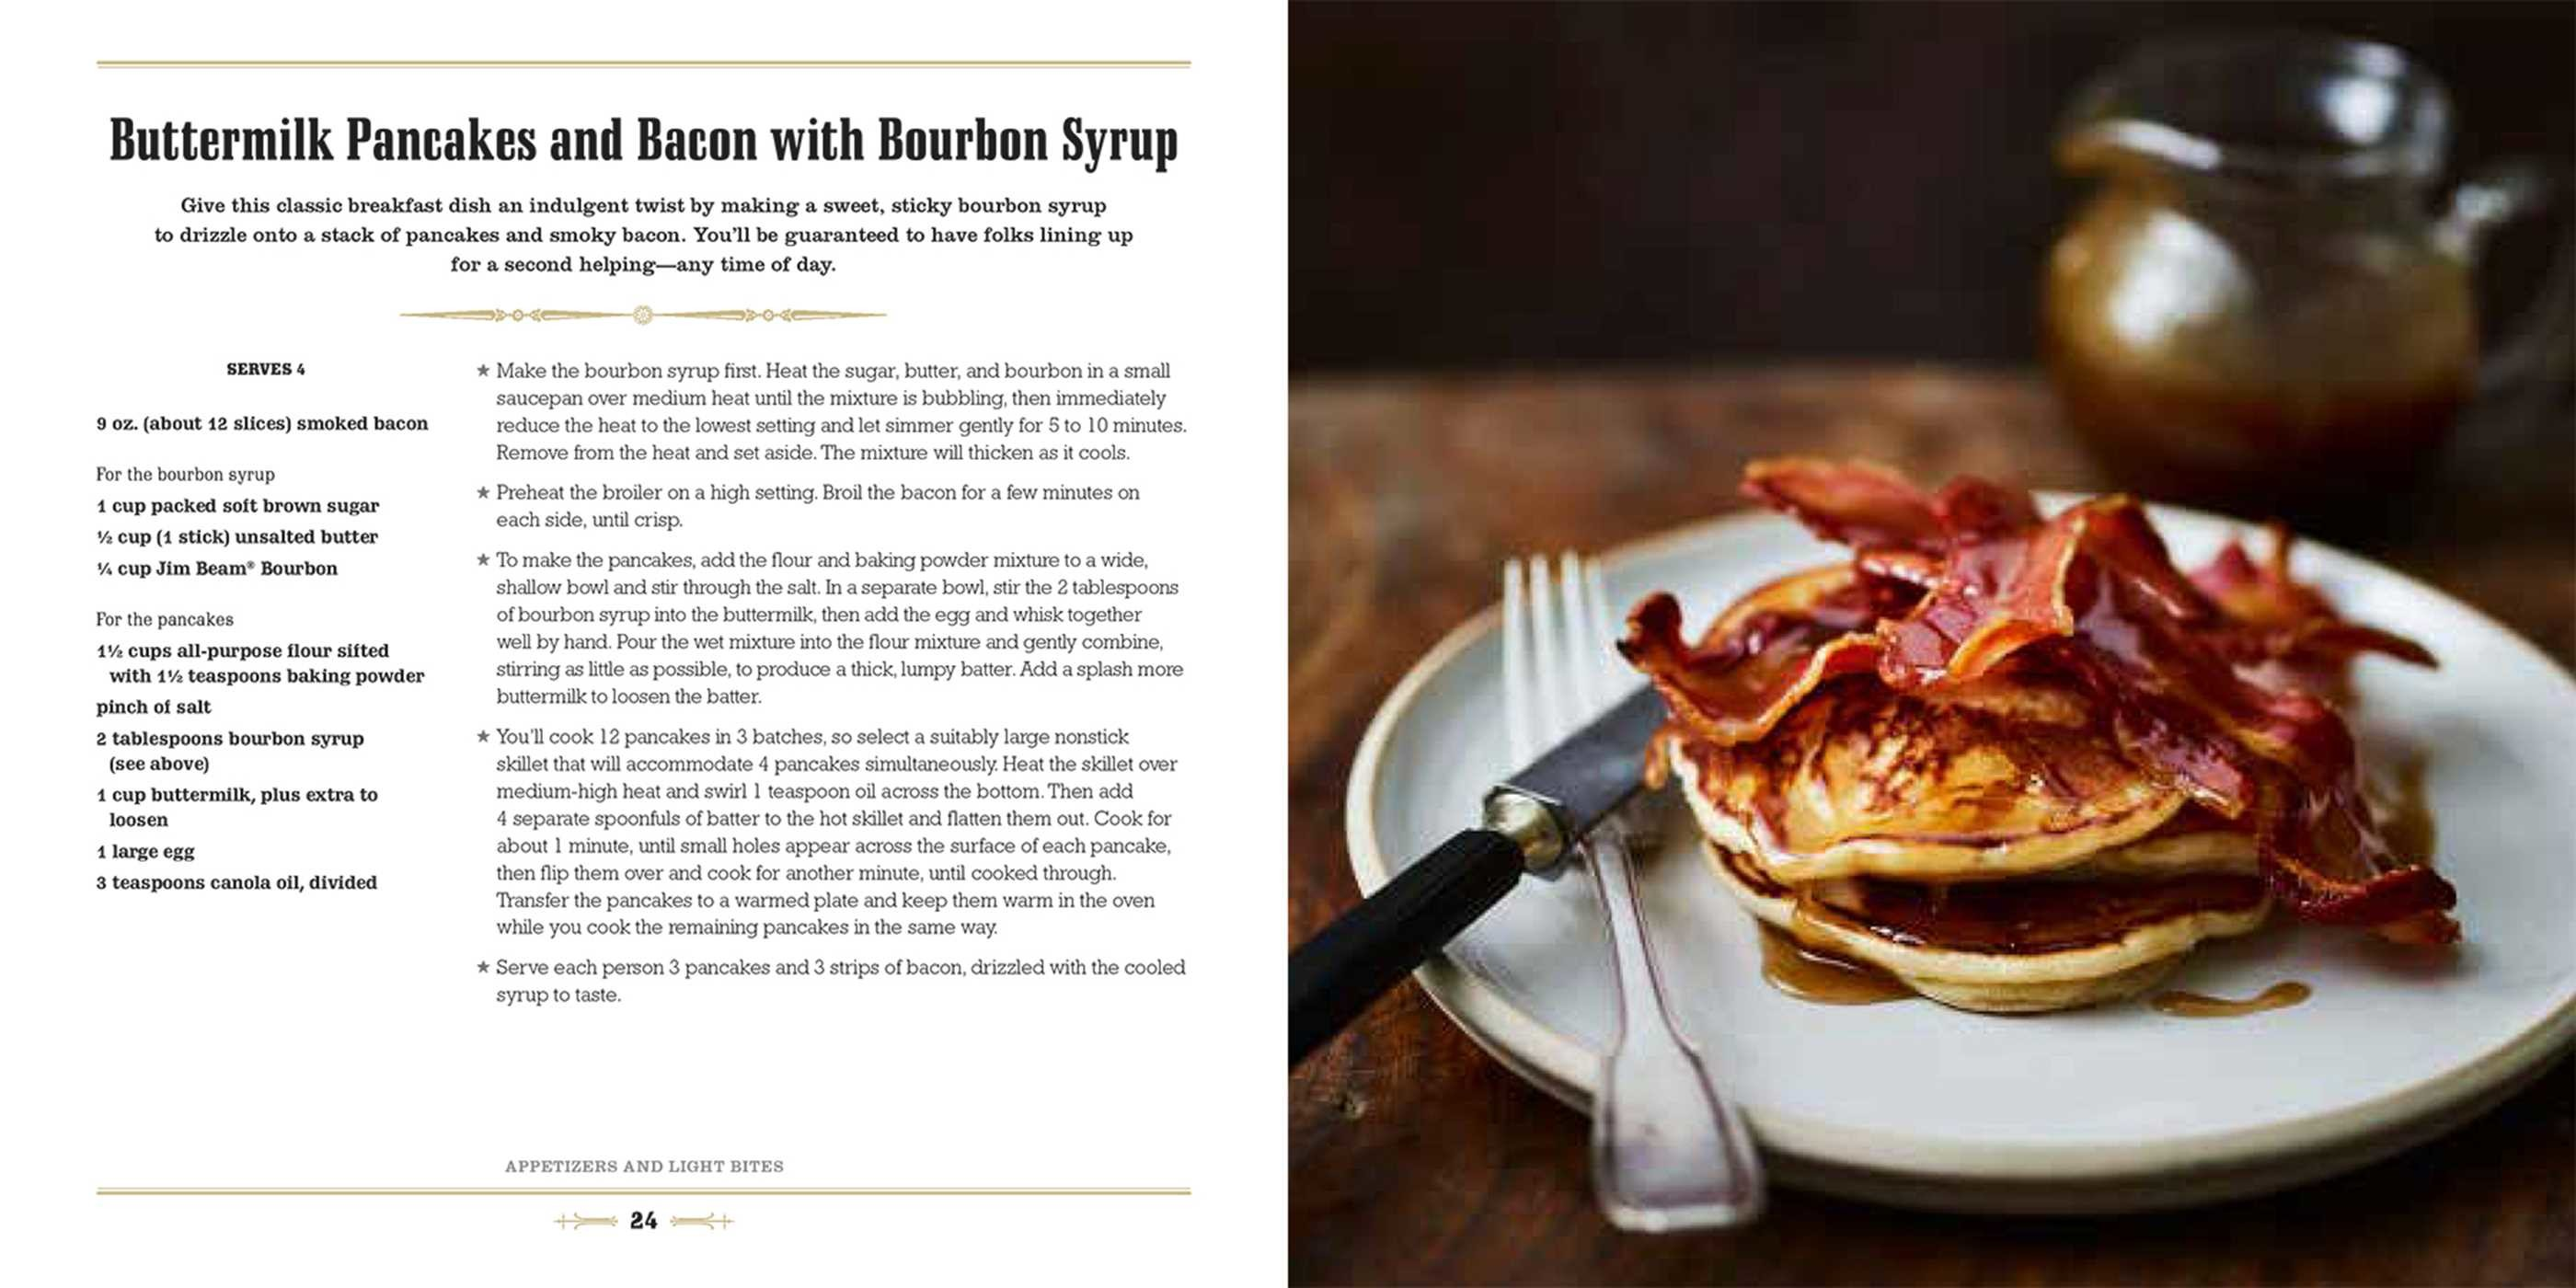 Jim beam bourbon cookbook 9781684120819.in01